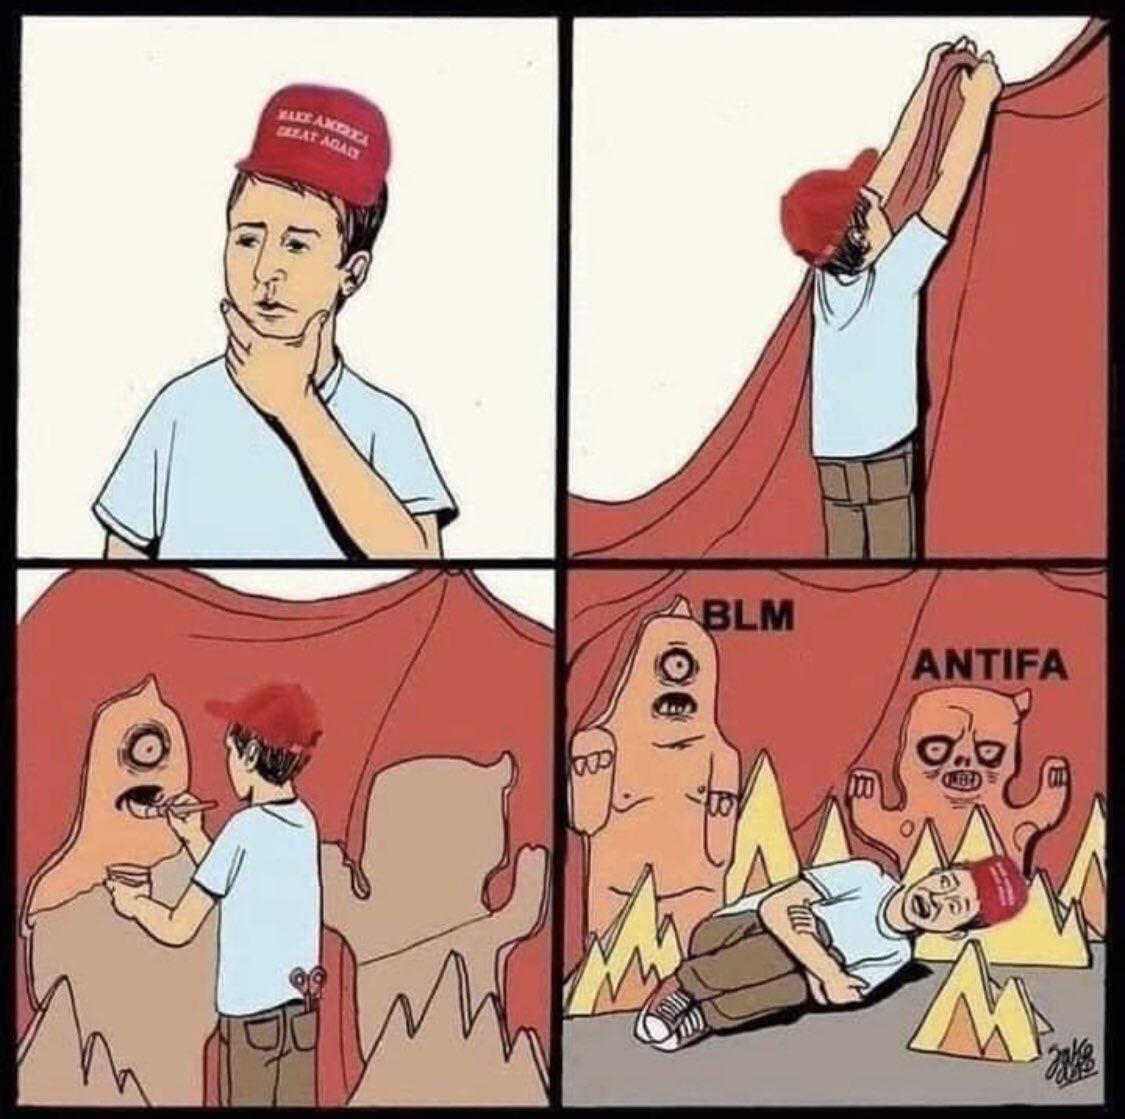 Memes Donald Trump supporters BLM antifa